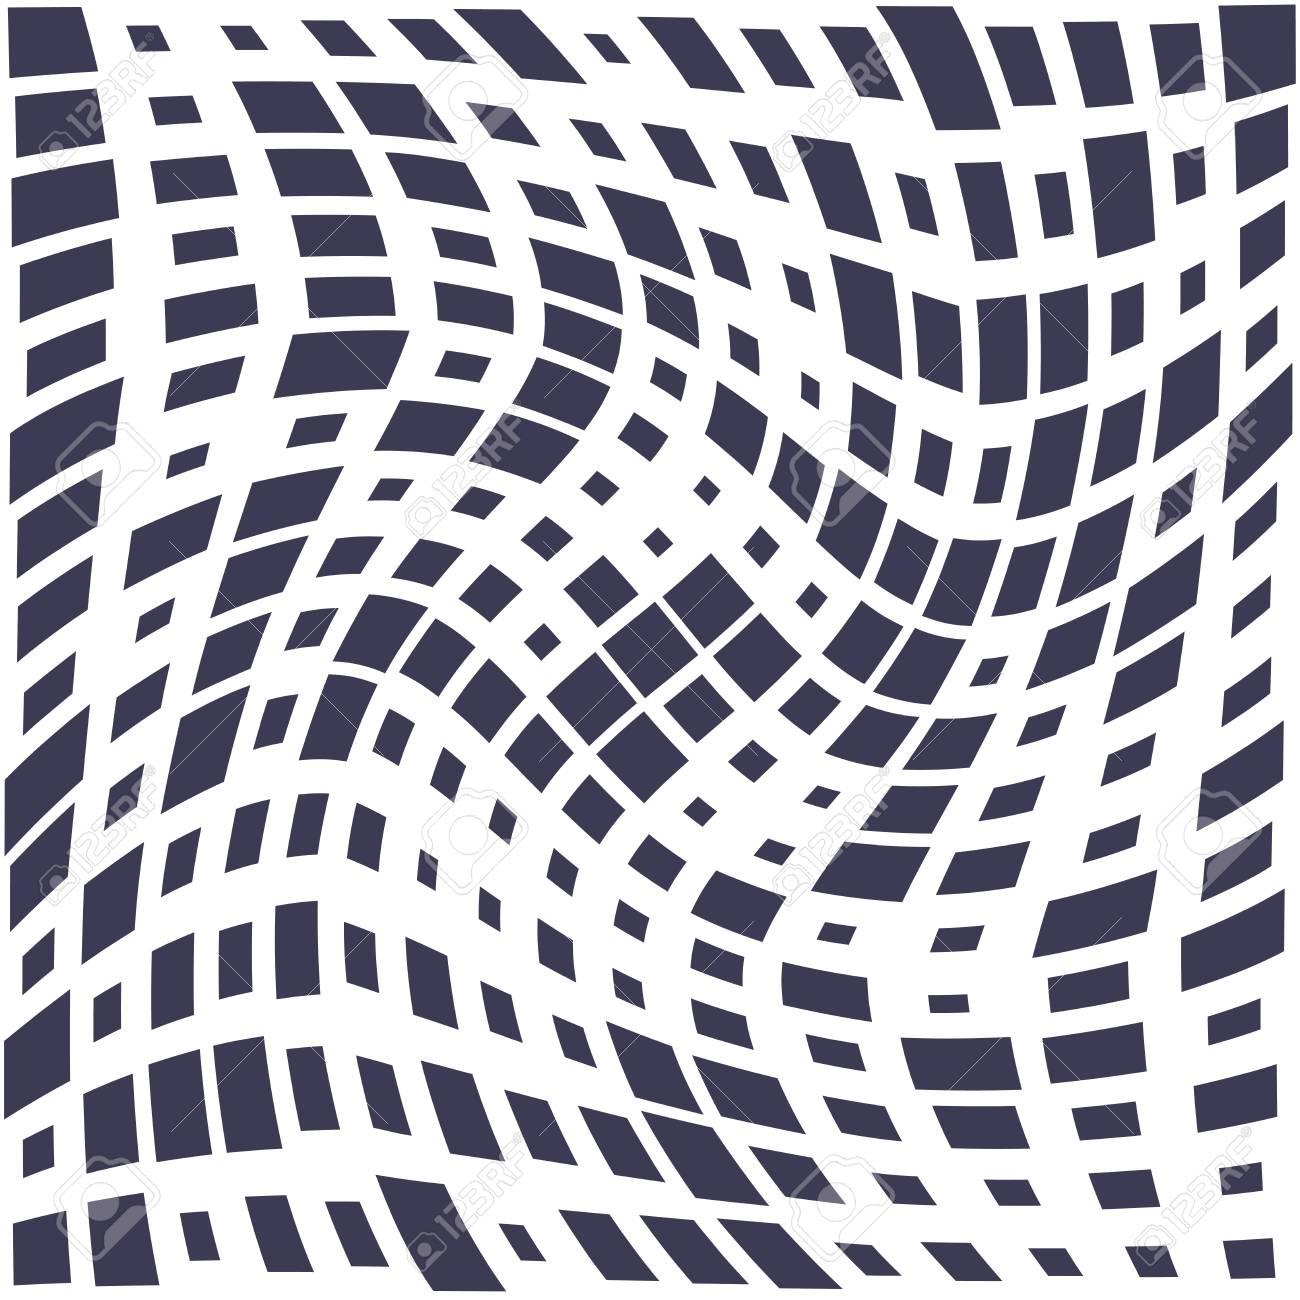 square trippy seamless pattern, minimal geometric background print texture - 126011429